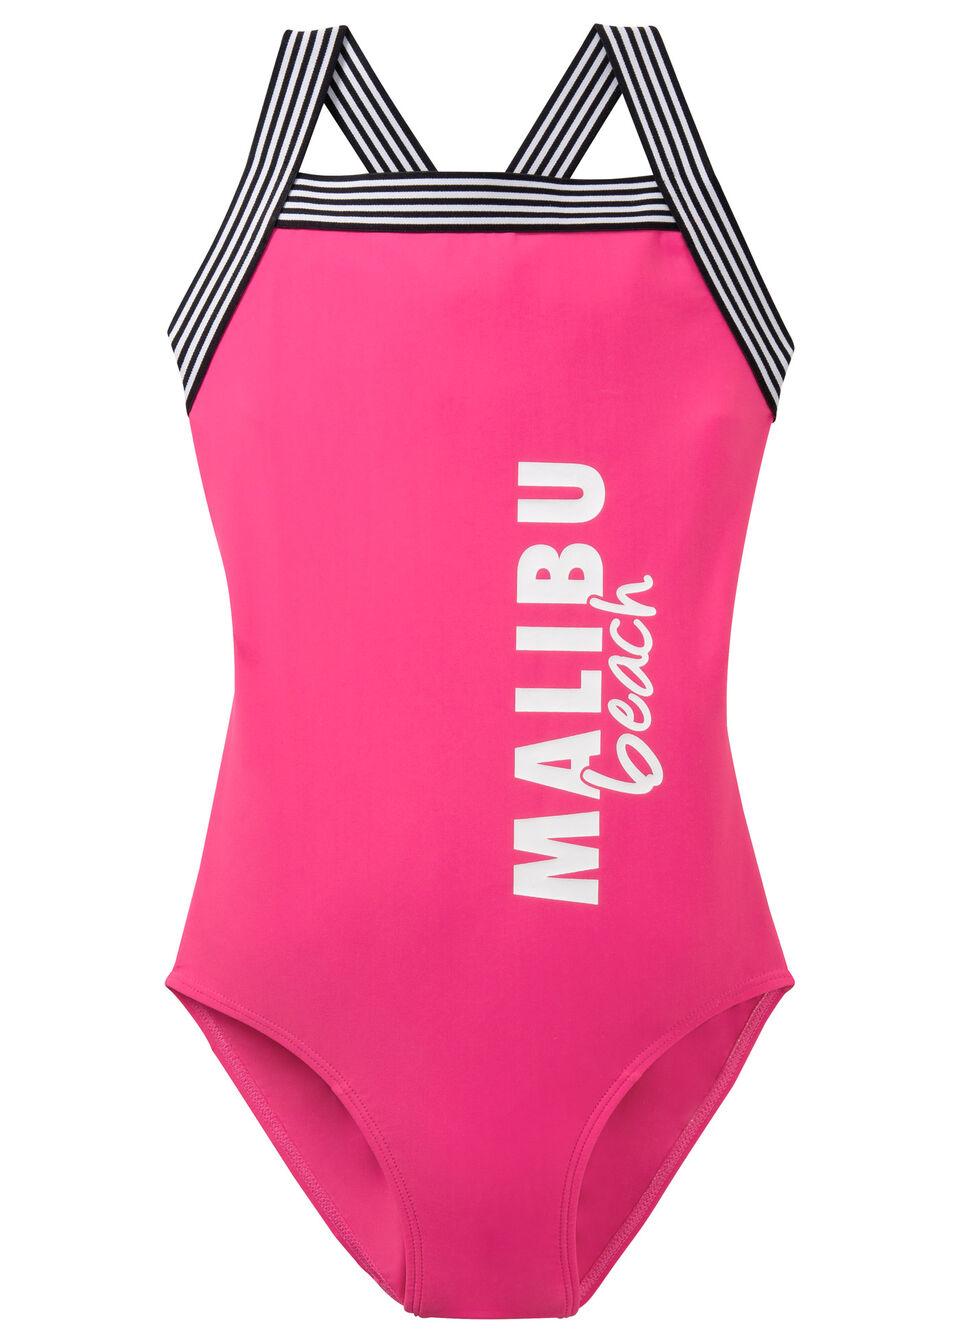 Plavky pre dievčatá bonprix